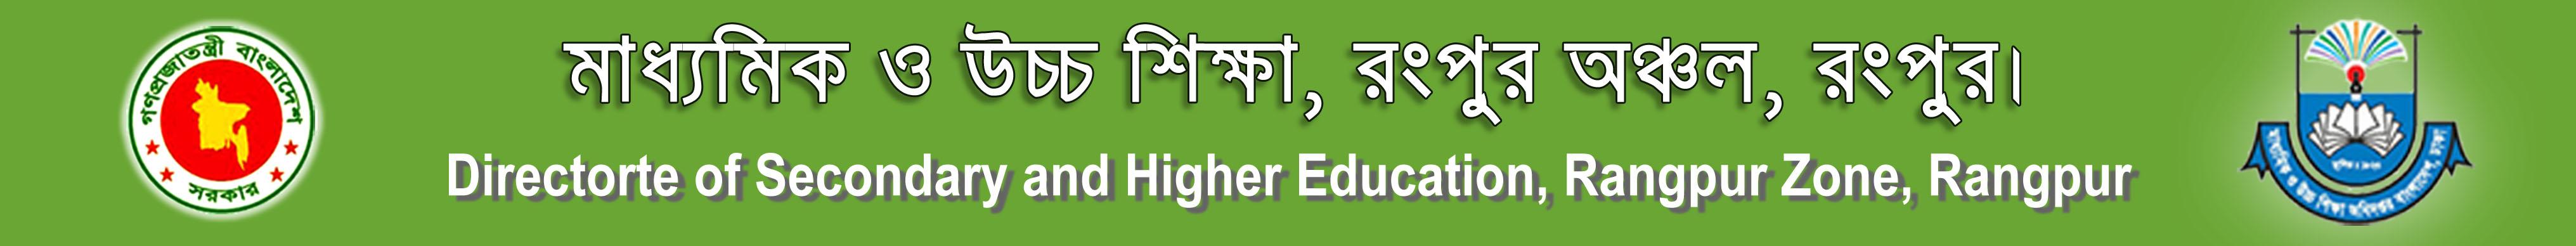 Janata College, KhagaKharibari, Dimla, Nilphamari